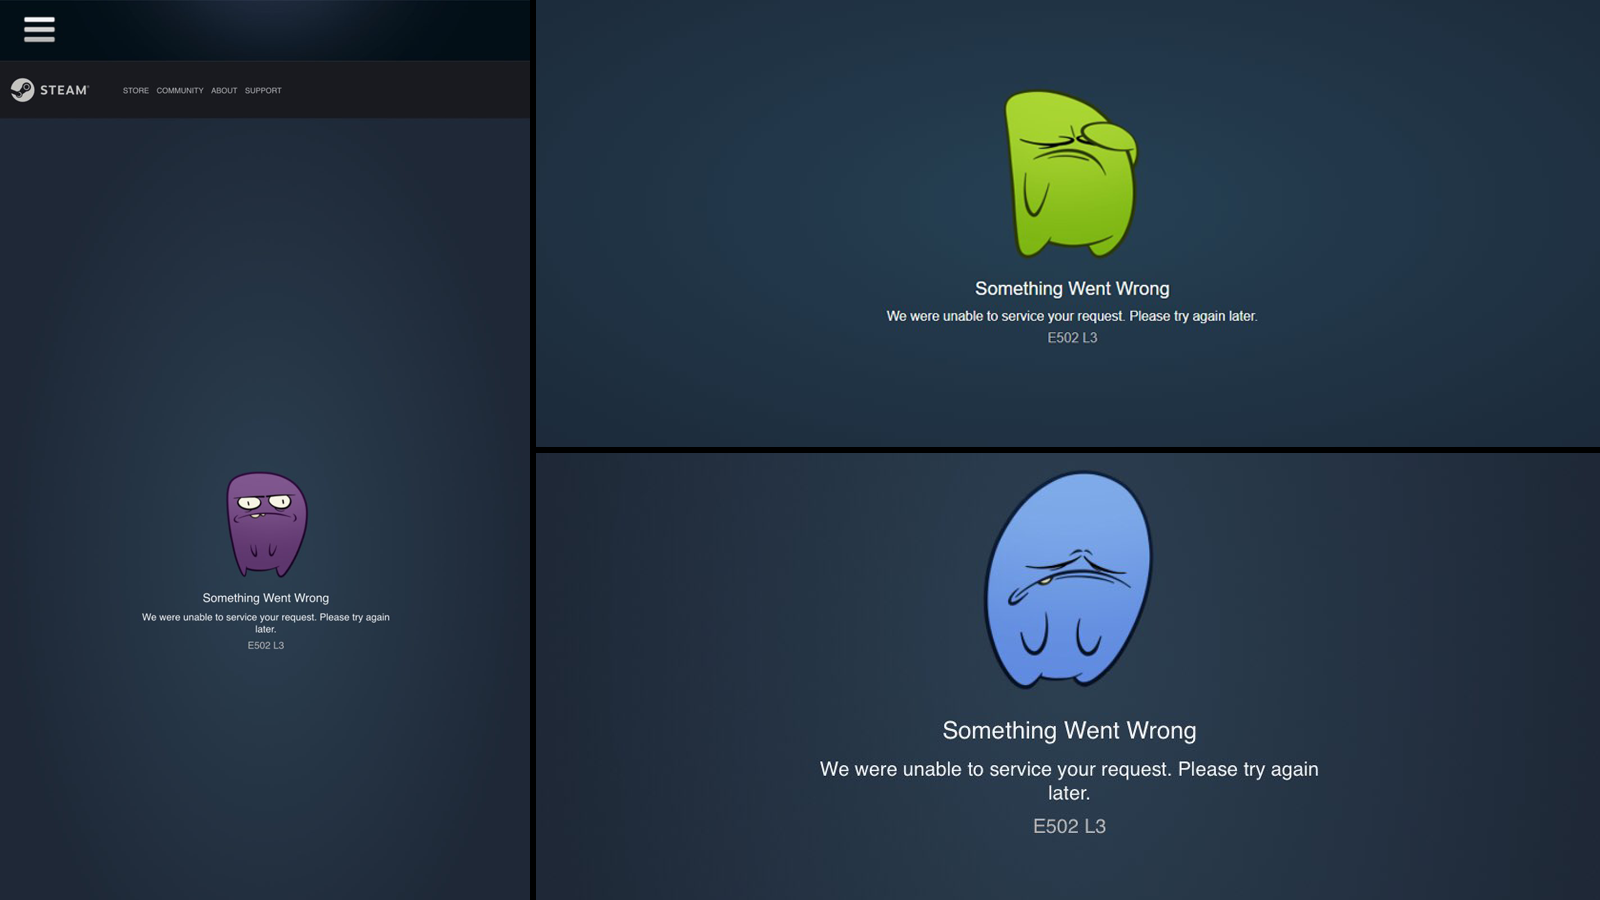 Valve's reservation system showing errors.